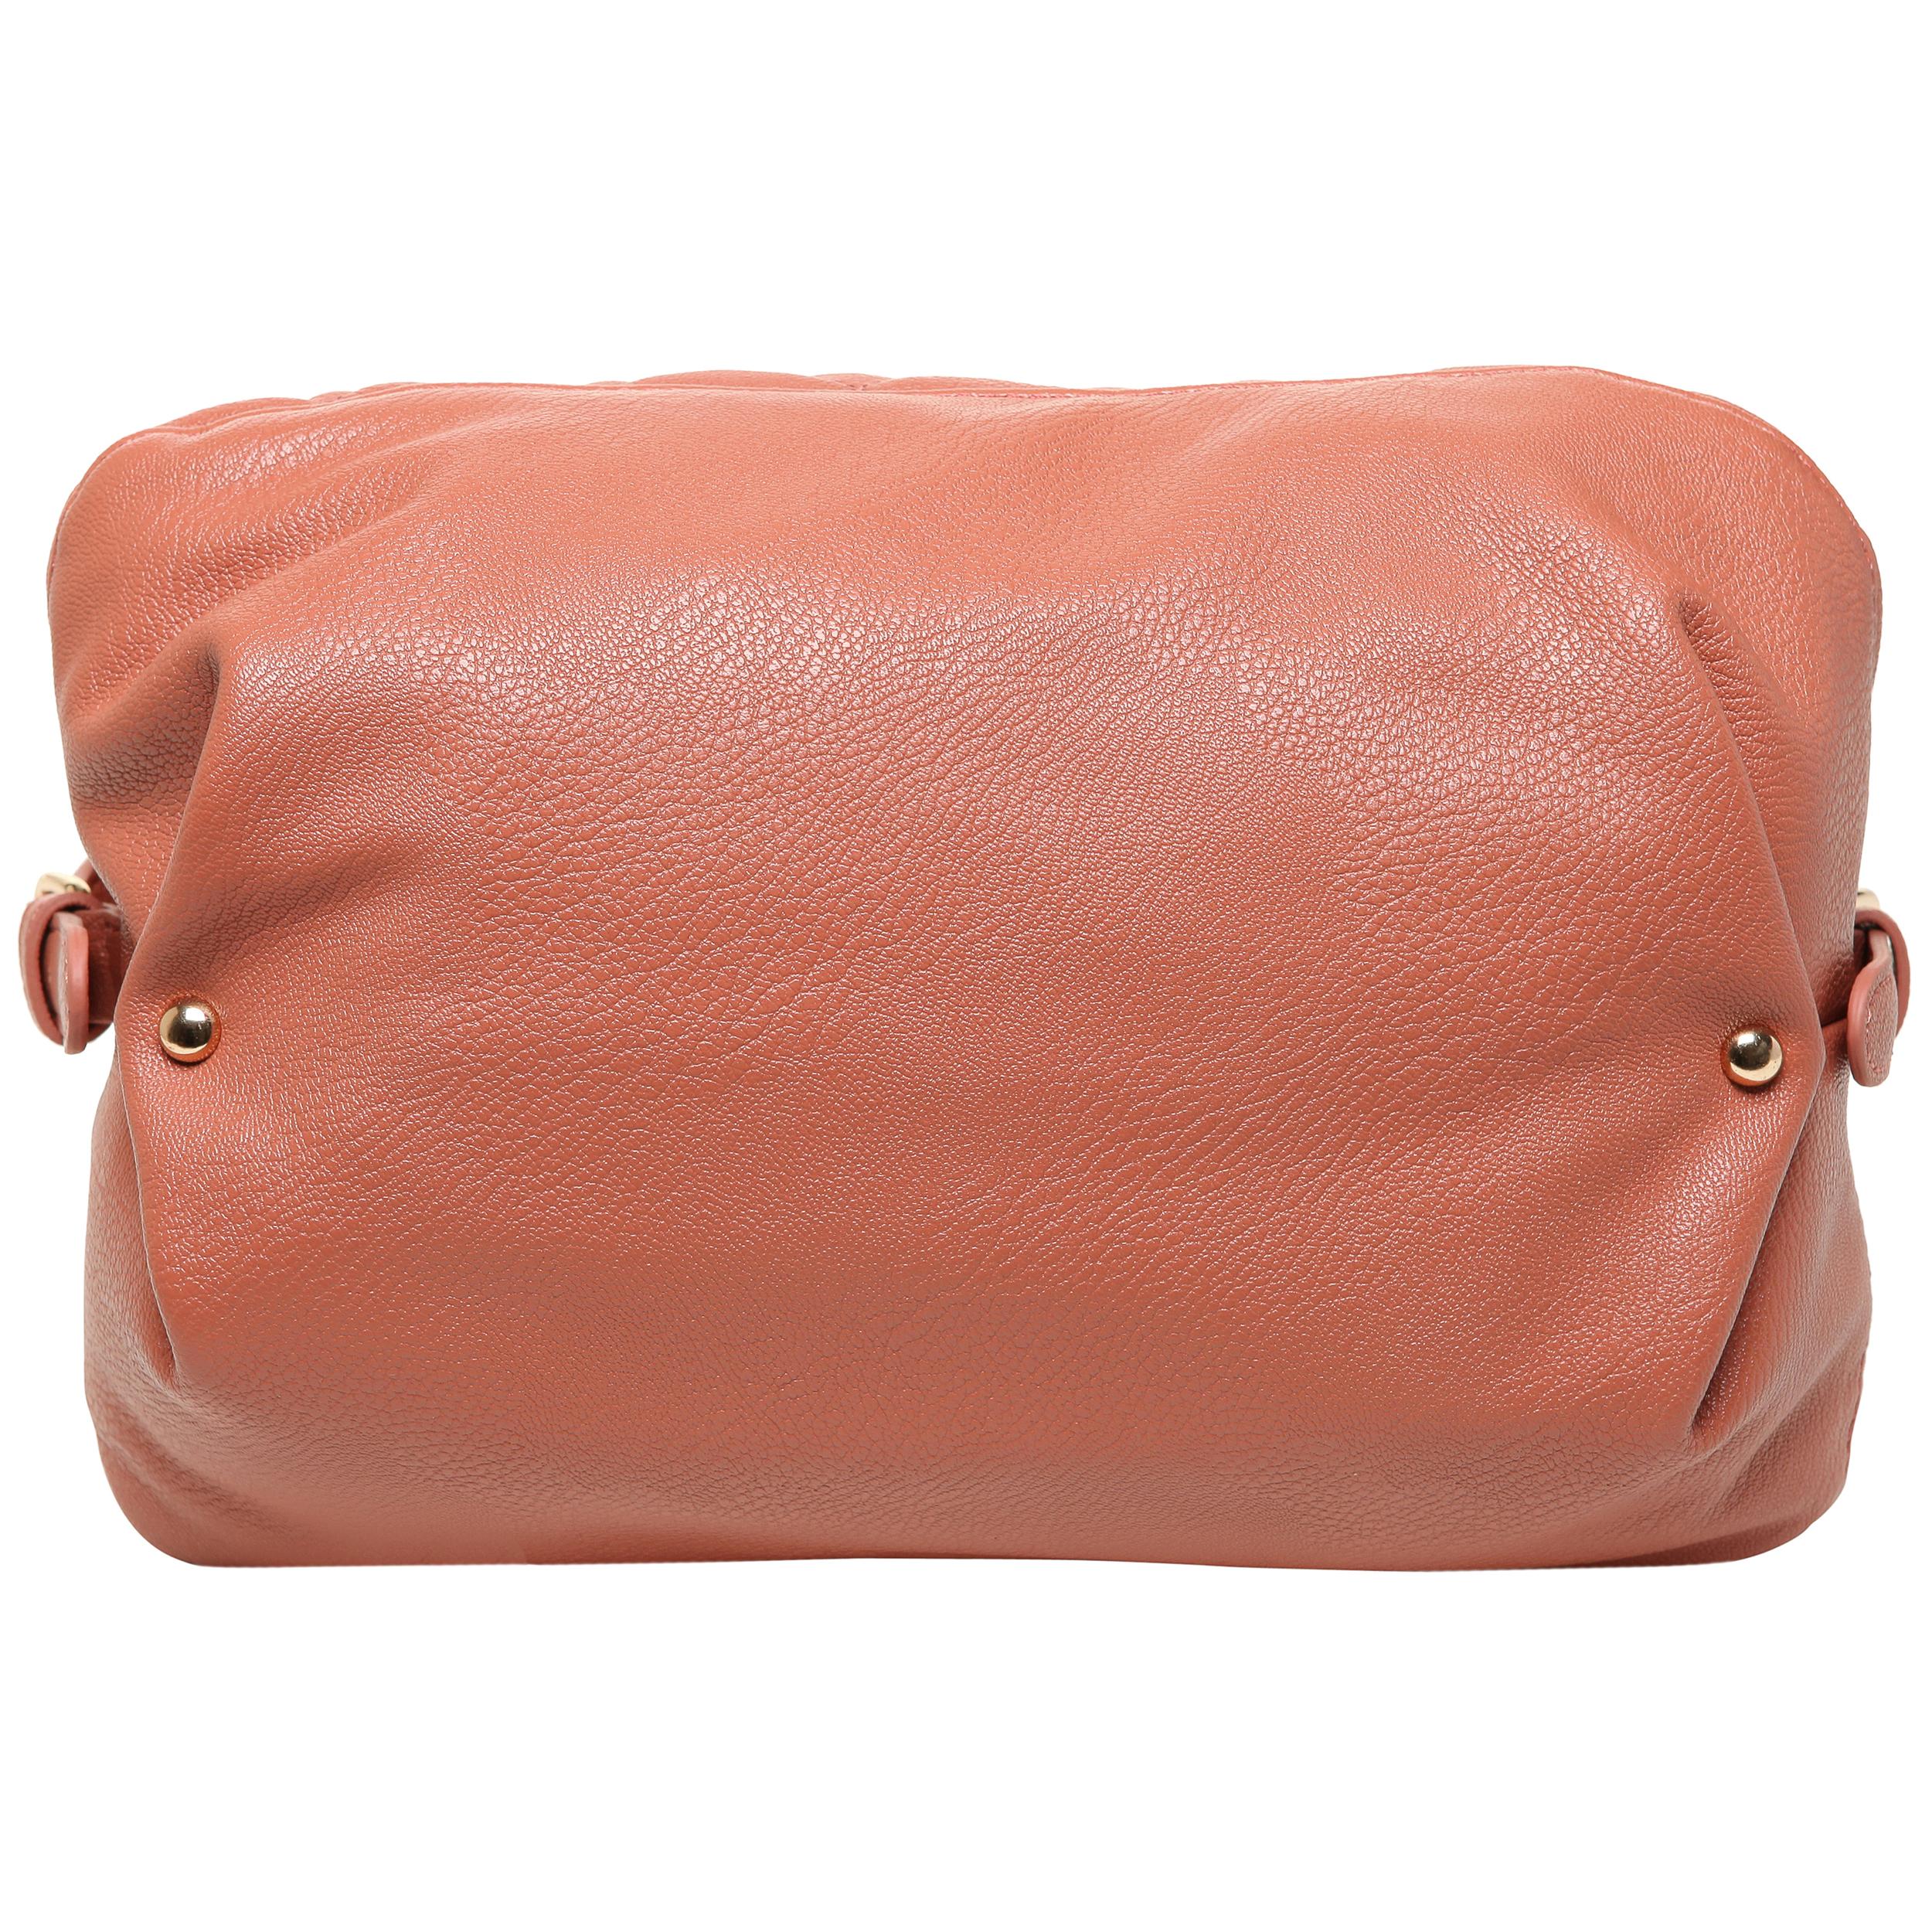 Imani pink quilted bowler designer handbag bottom image